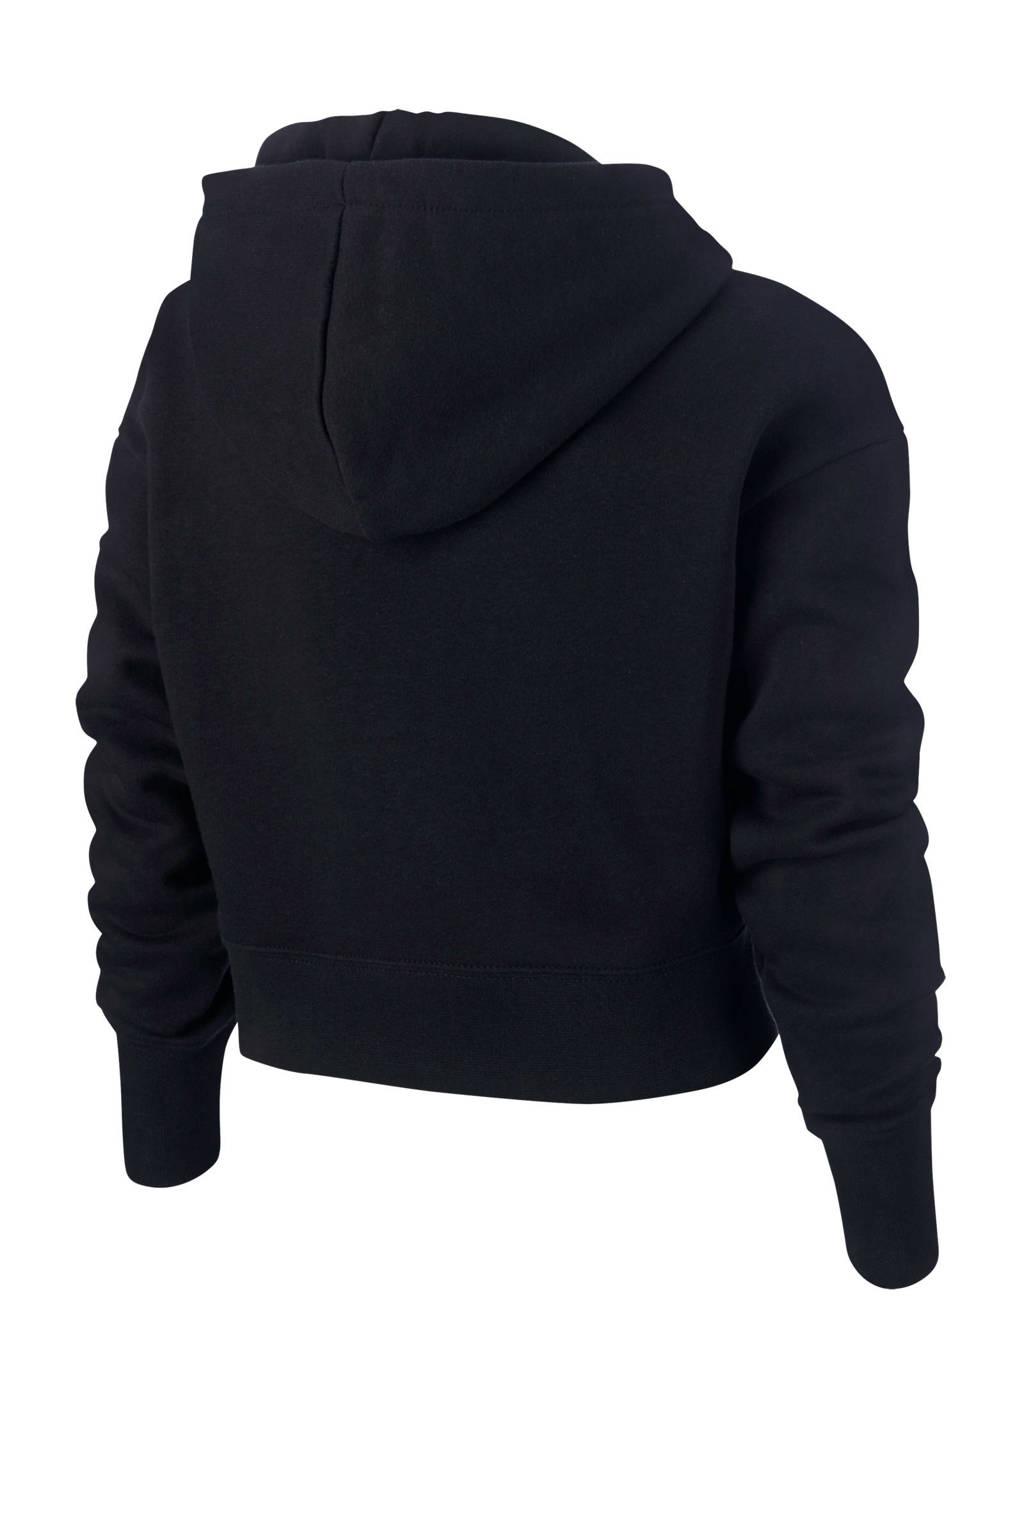 Nike hoodie met logo zwart, Zwart